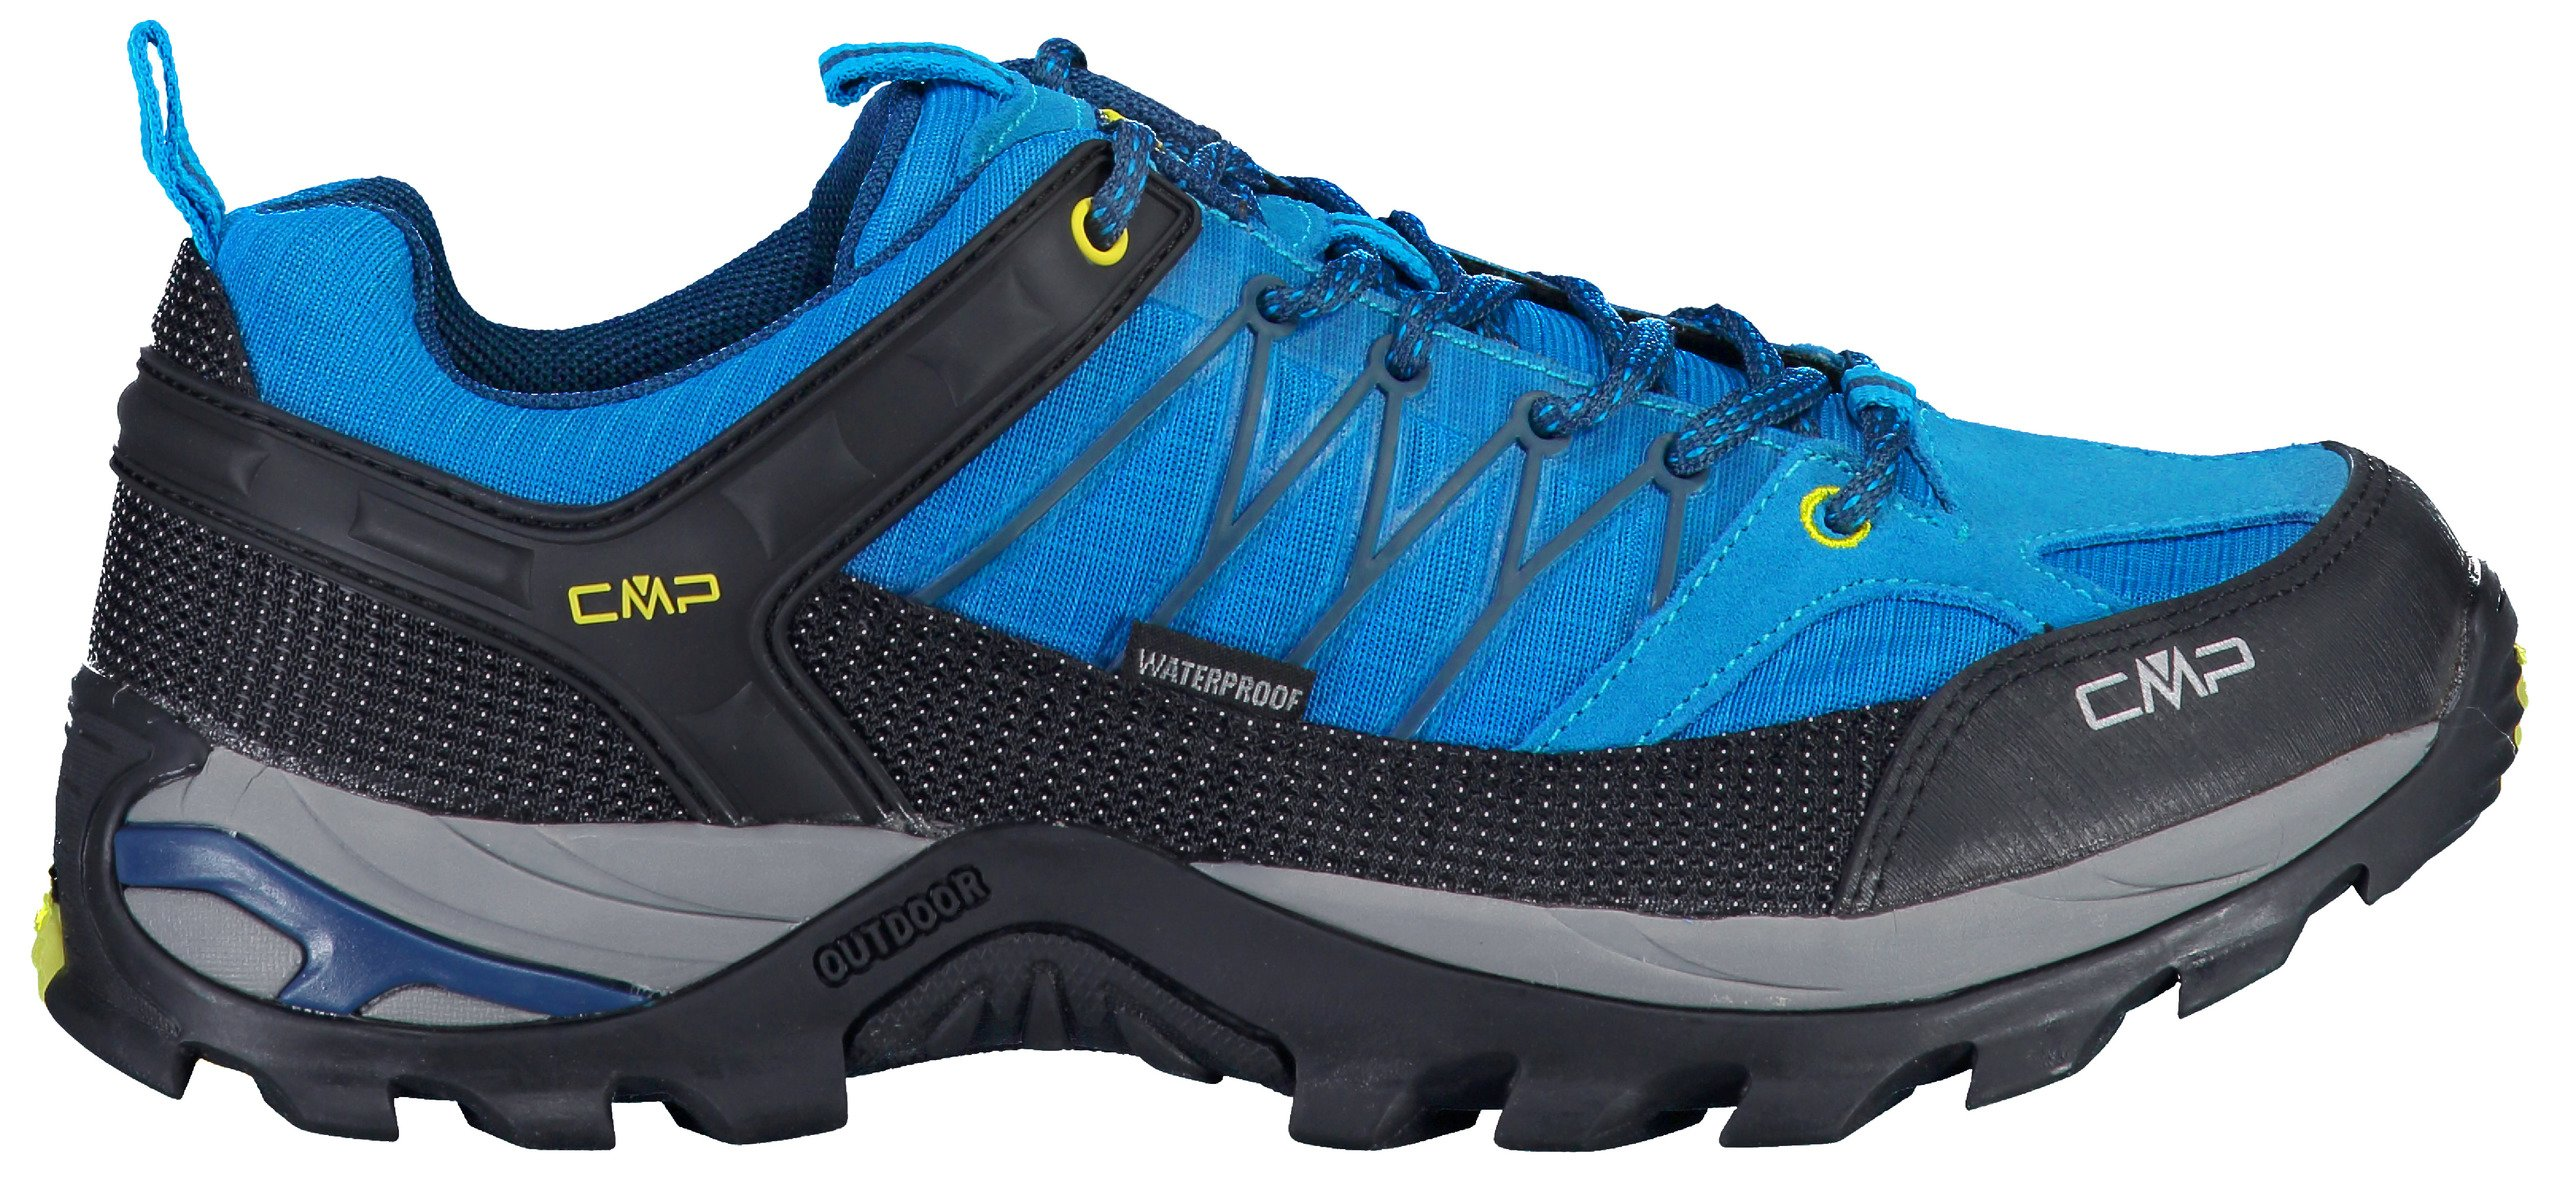 Cmp Herren Trekkingschuhe Rigel Low Wp Slip On Shoes Shoes Boots Outdoor Clothes Grube Eu